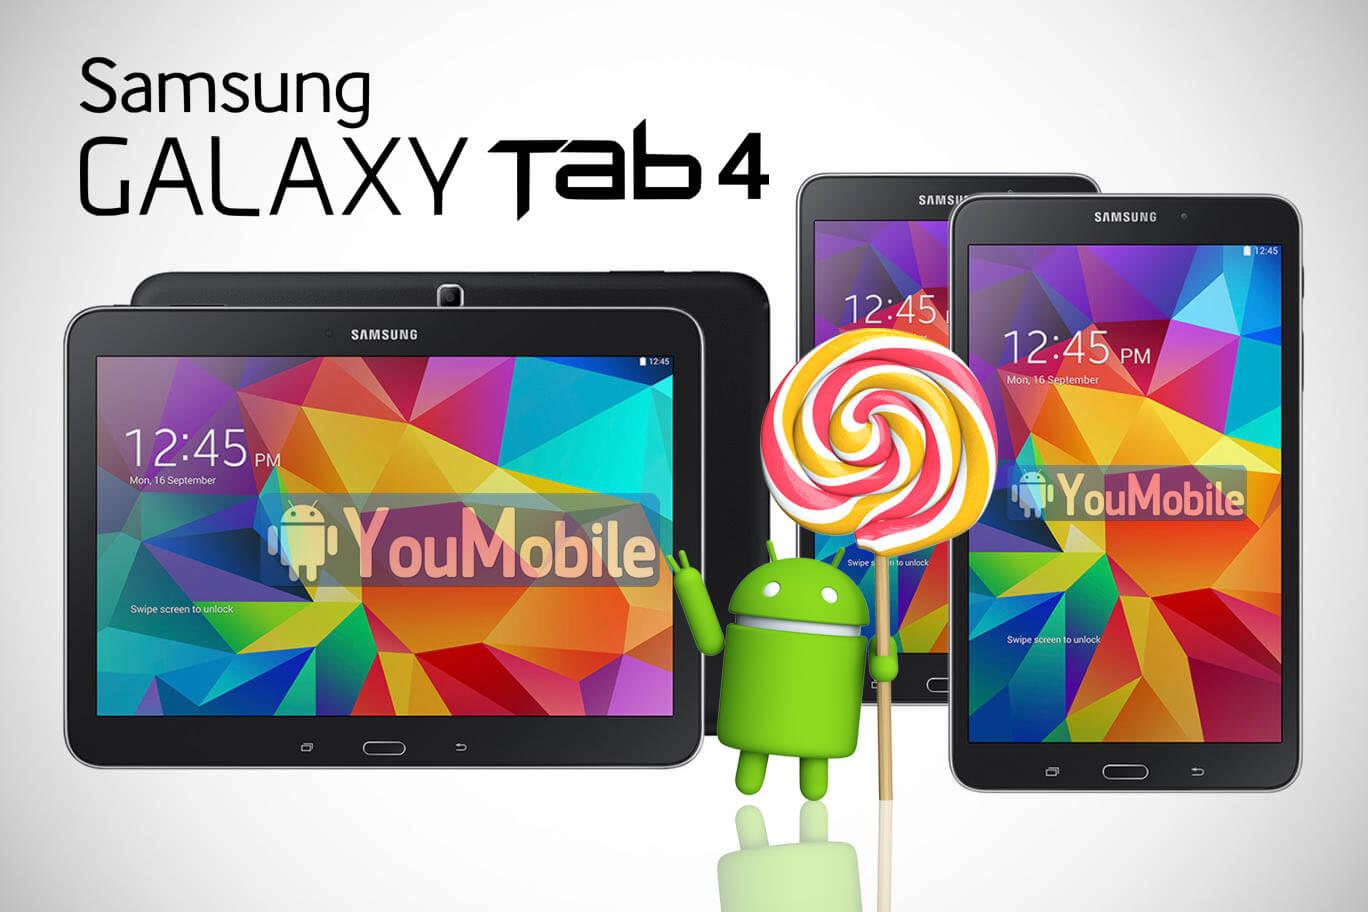 Galaxy Tab 4 Official Lollipop update